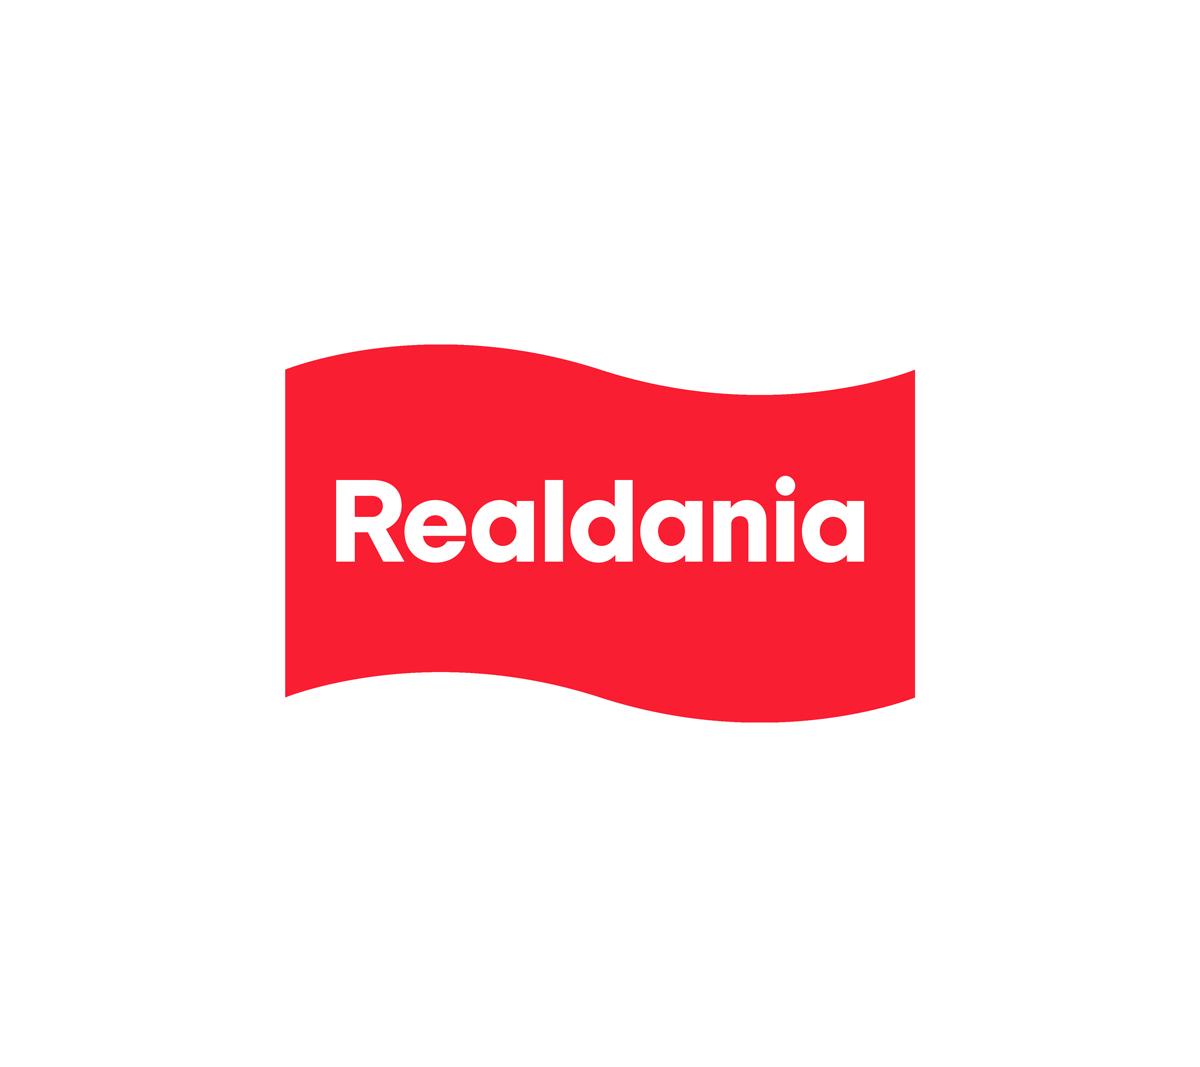 Realdania_logo_1200px.png